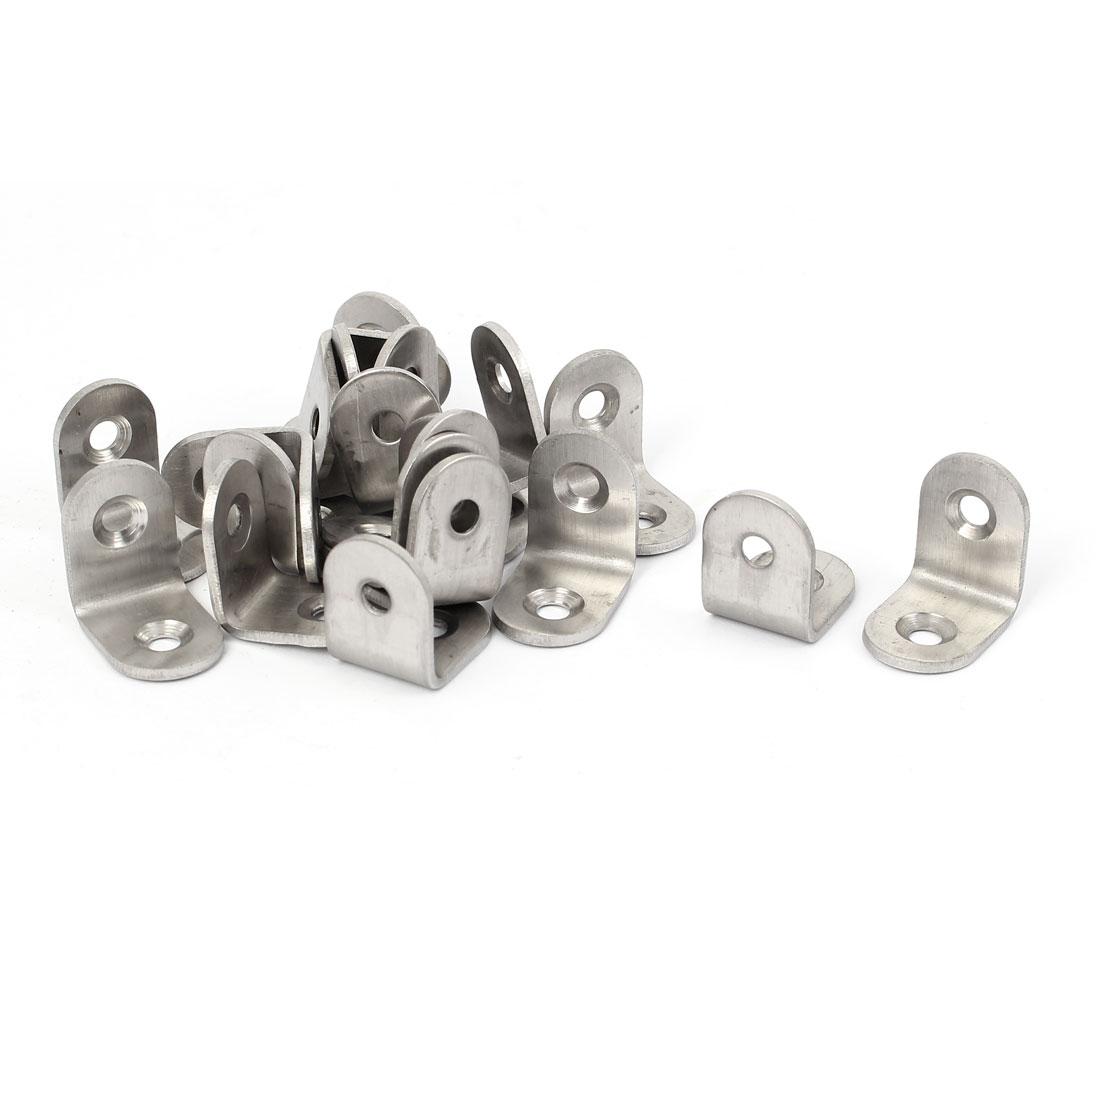 20mmx20mmx2mm 2 Holes Corner Brace Joint Angle Bracket Support 20pcs